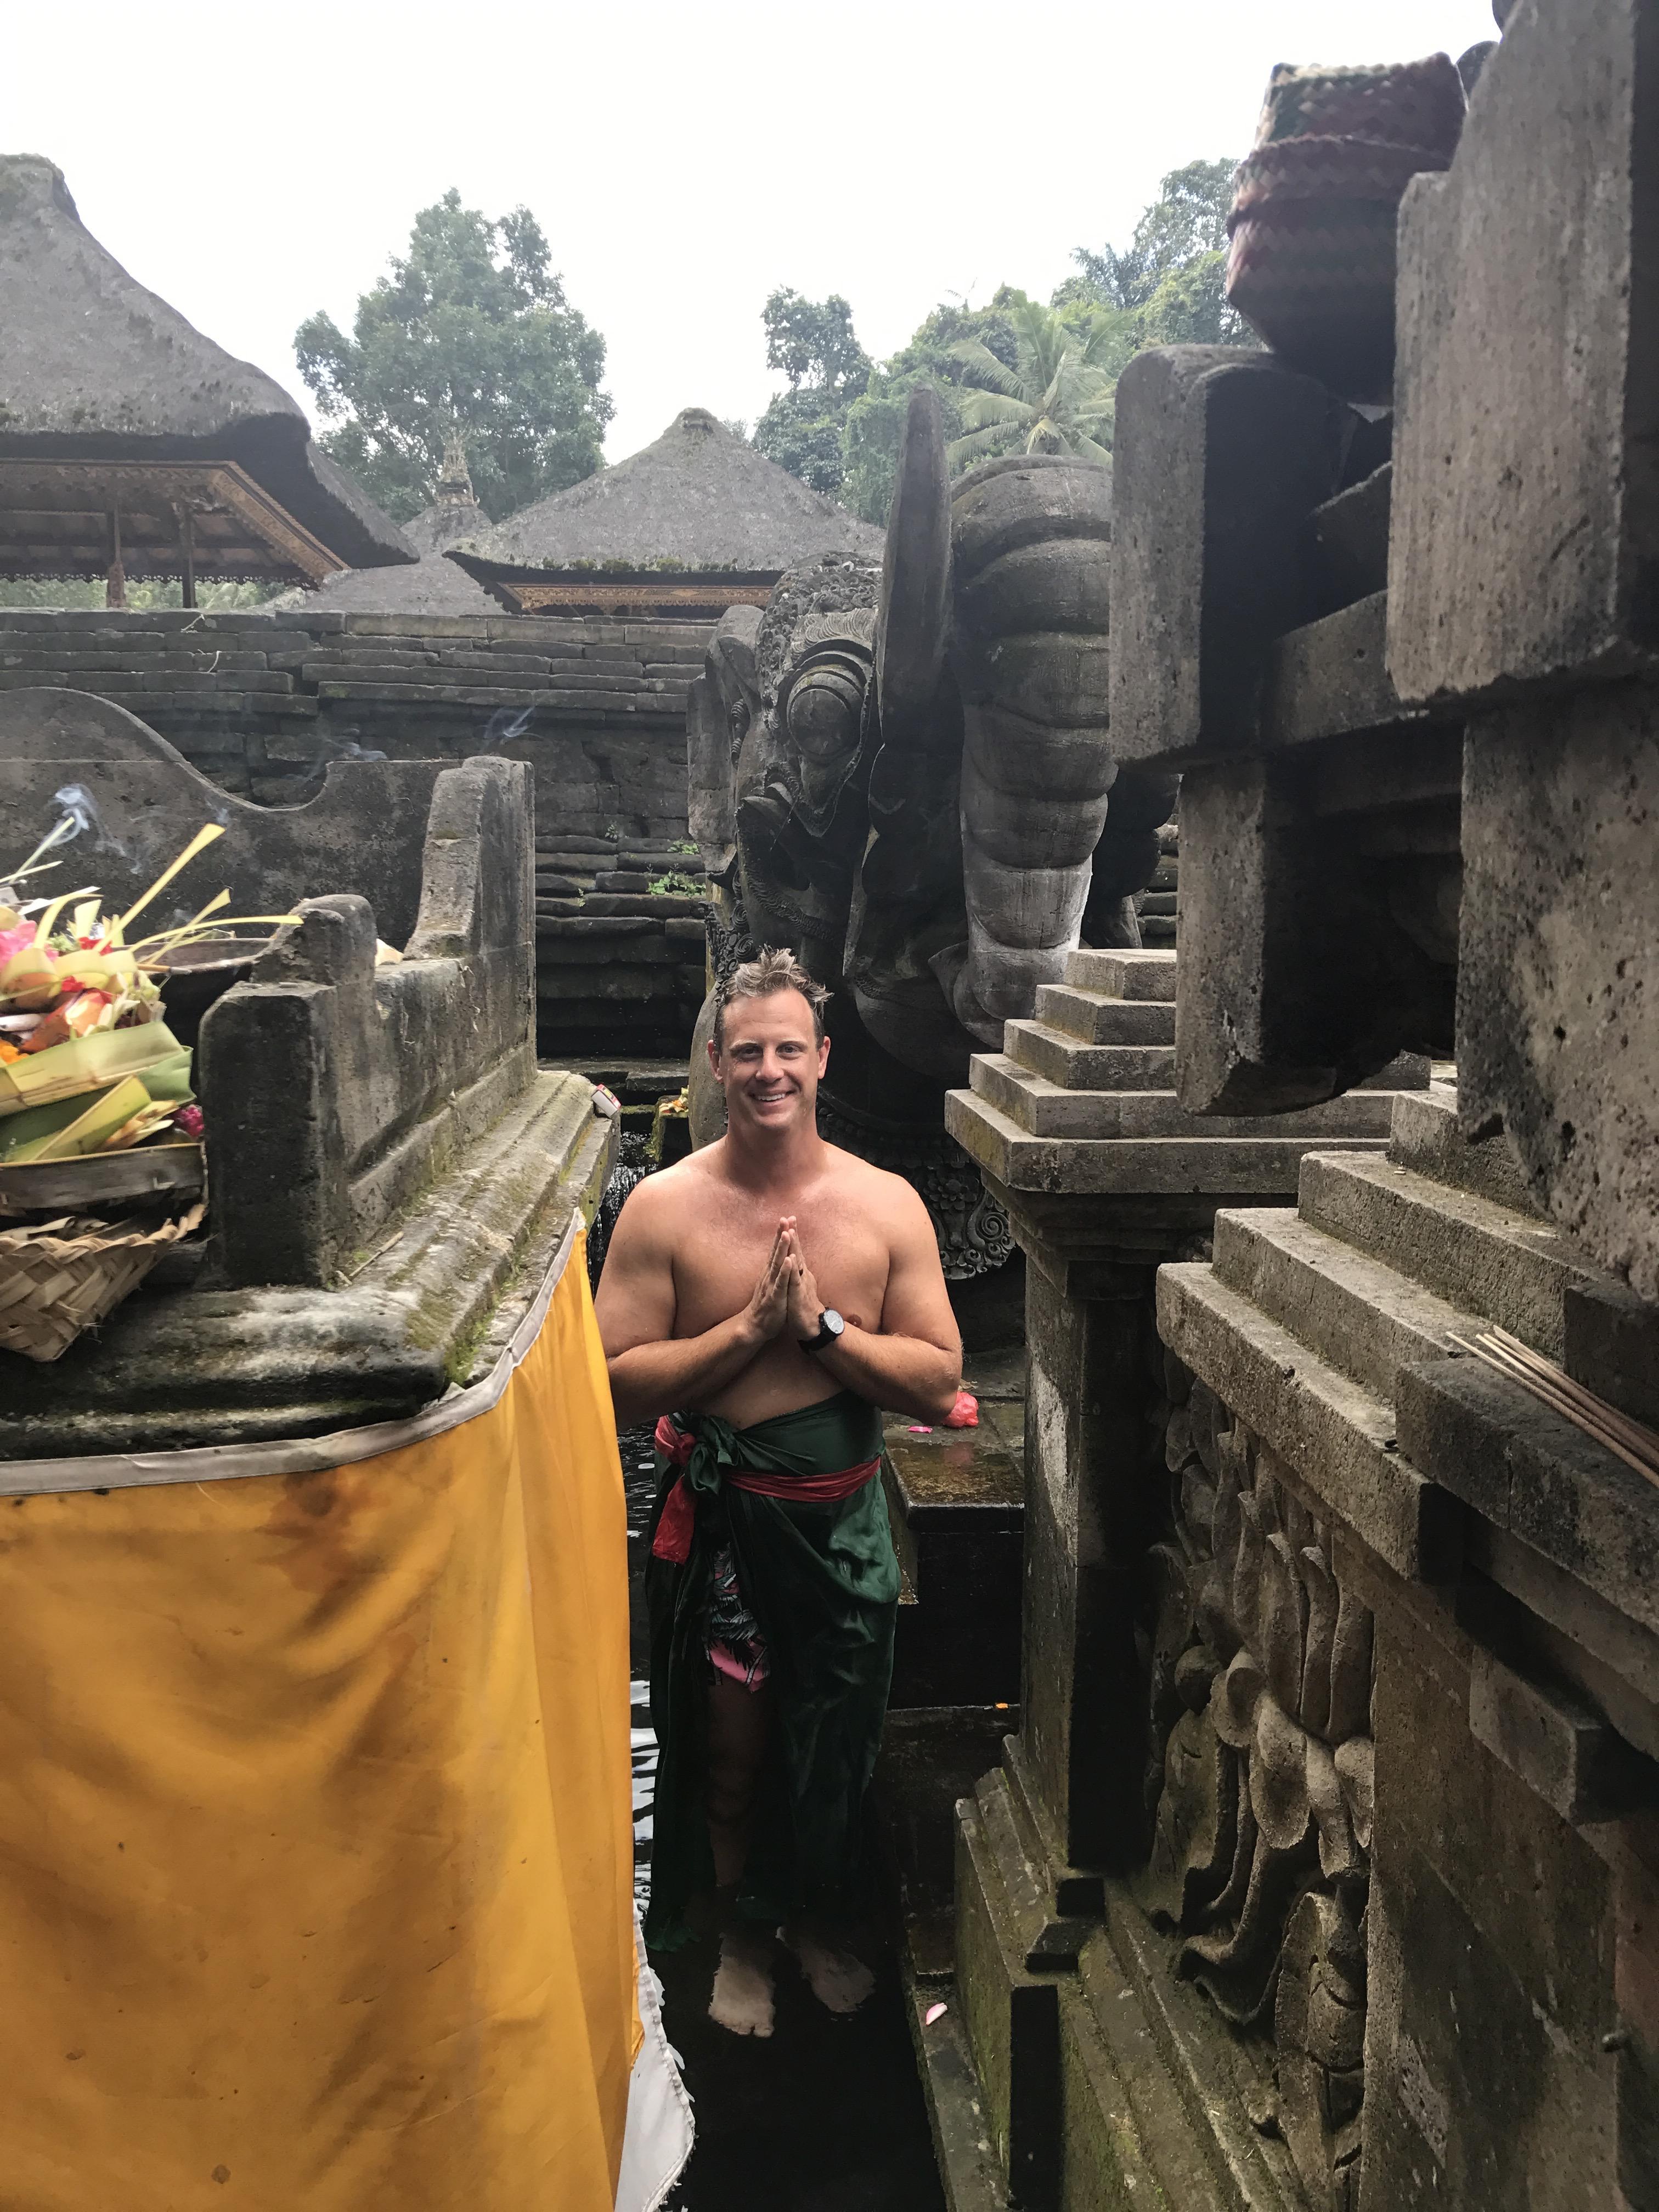 Tirta Empul Temple - Ubud, Bali, Indonesia - Our Bali Trip - Communikait